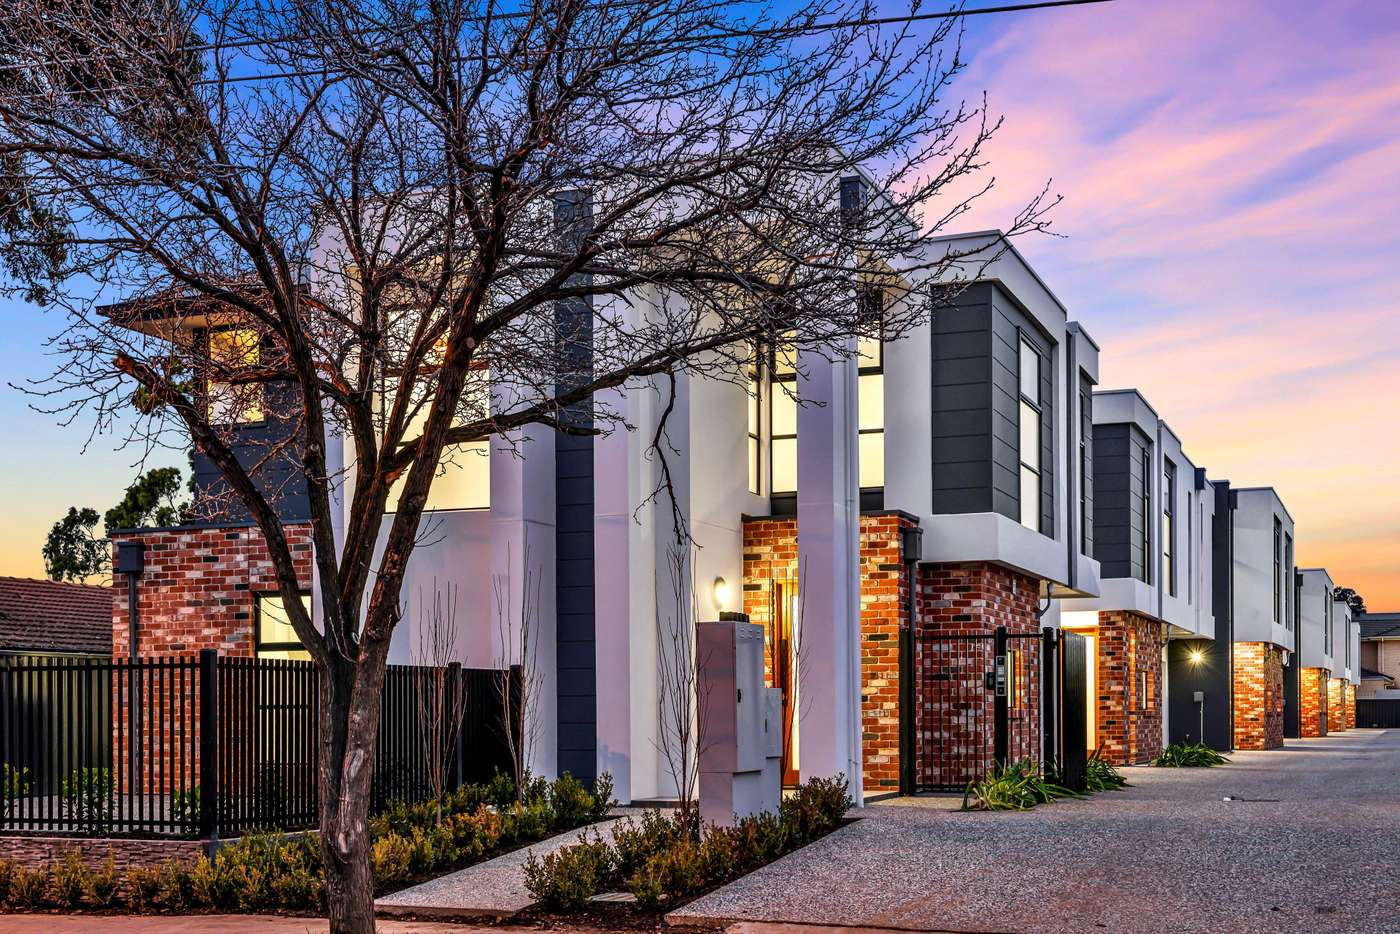 Main view of Homely house listing, 9/118 Hawker Street, Ridleyton SA 5008